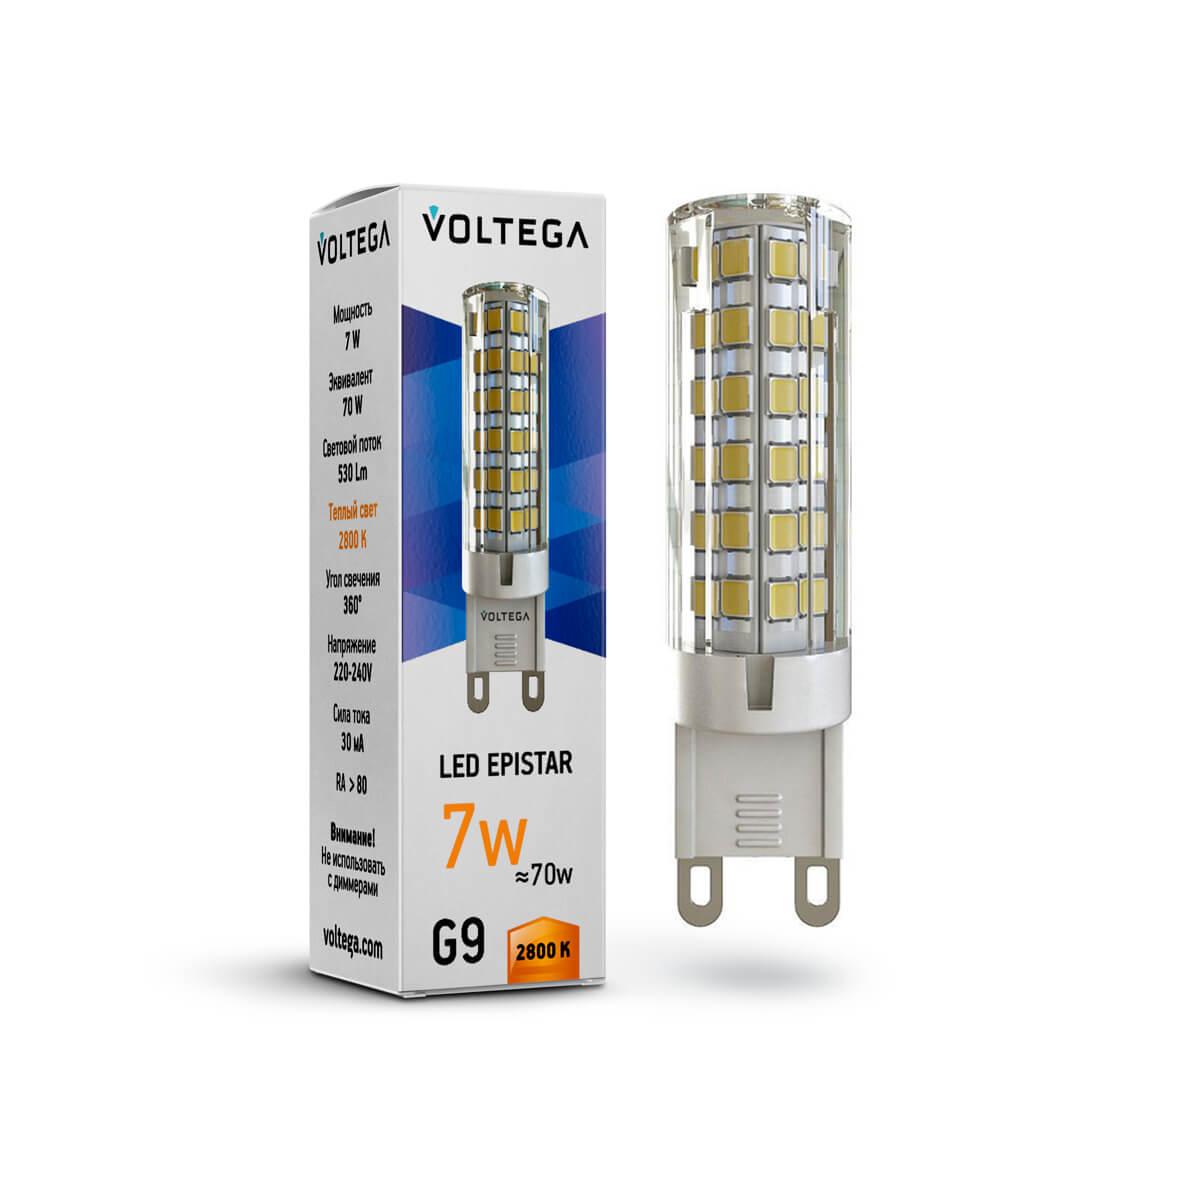 Лампа светодиодная Voltega G9 7W 2800К прозрачная VG9-K1G9warm7W 7036 ретро лампа 5928 voltega